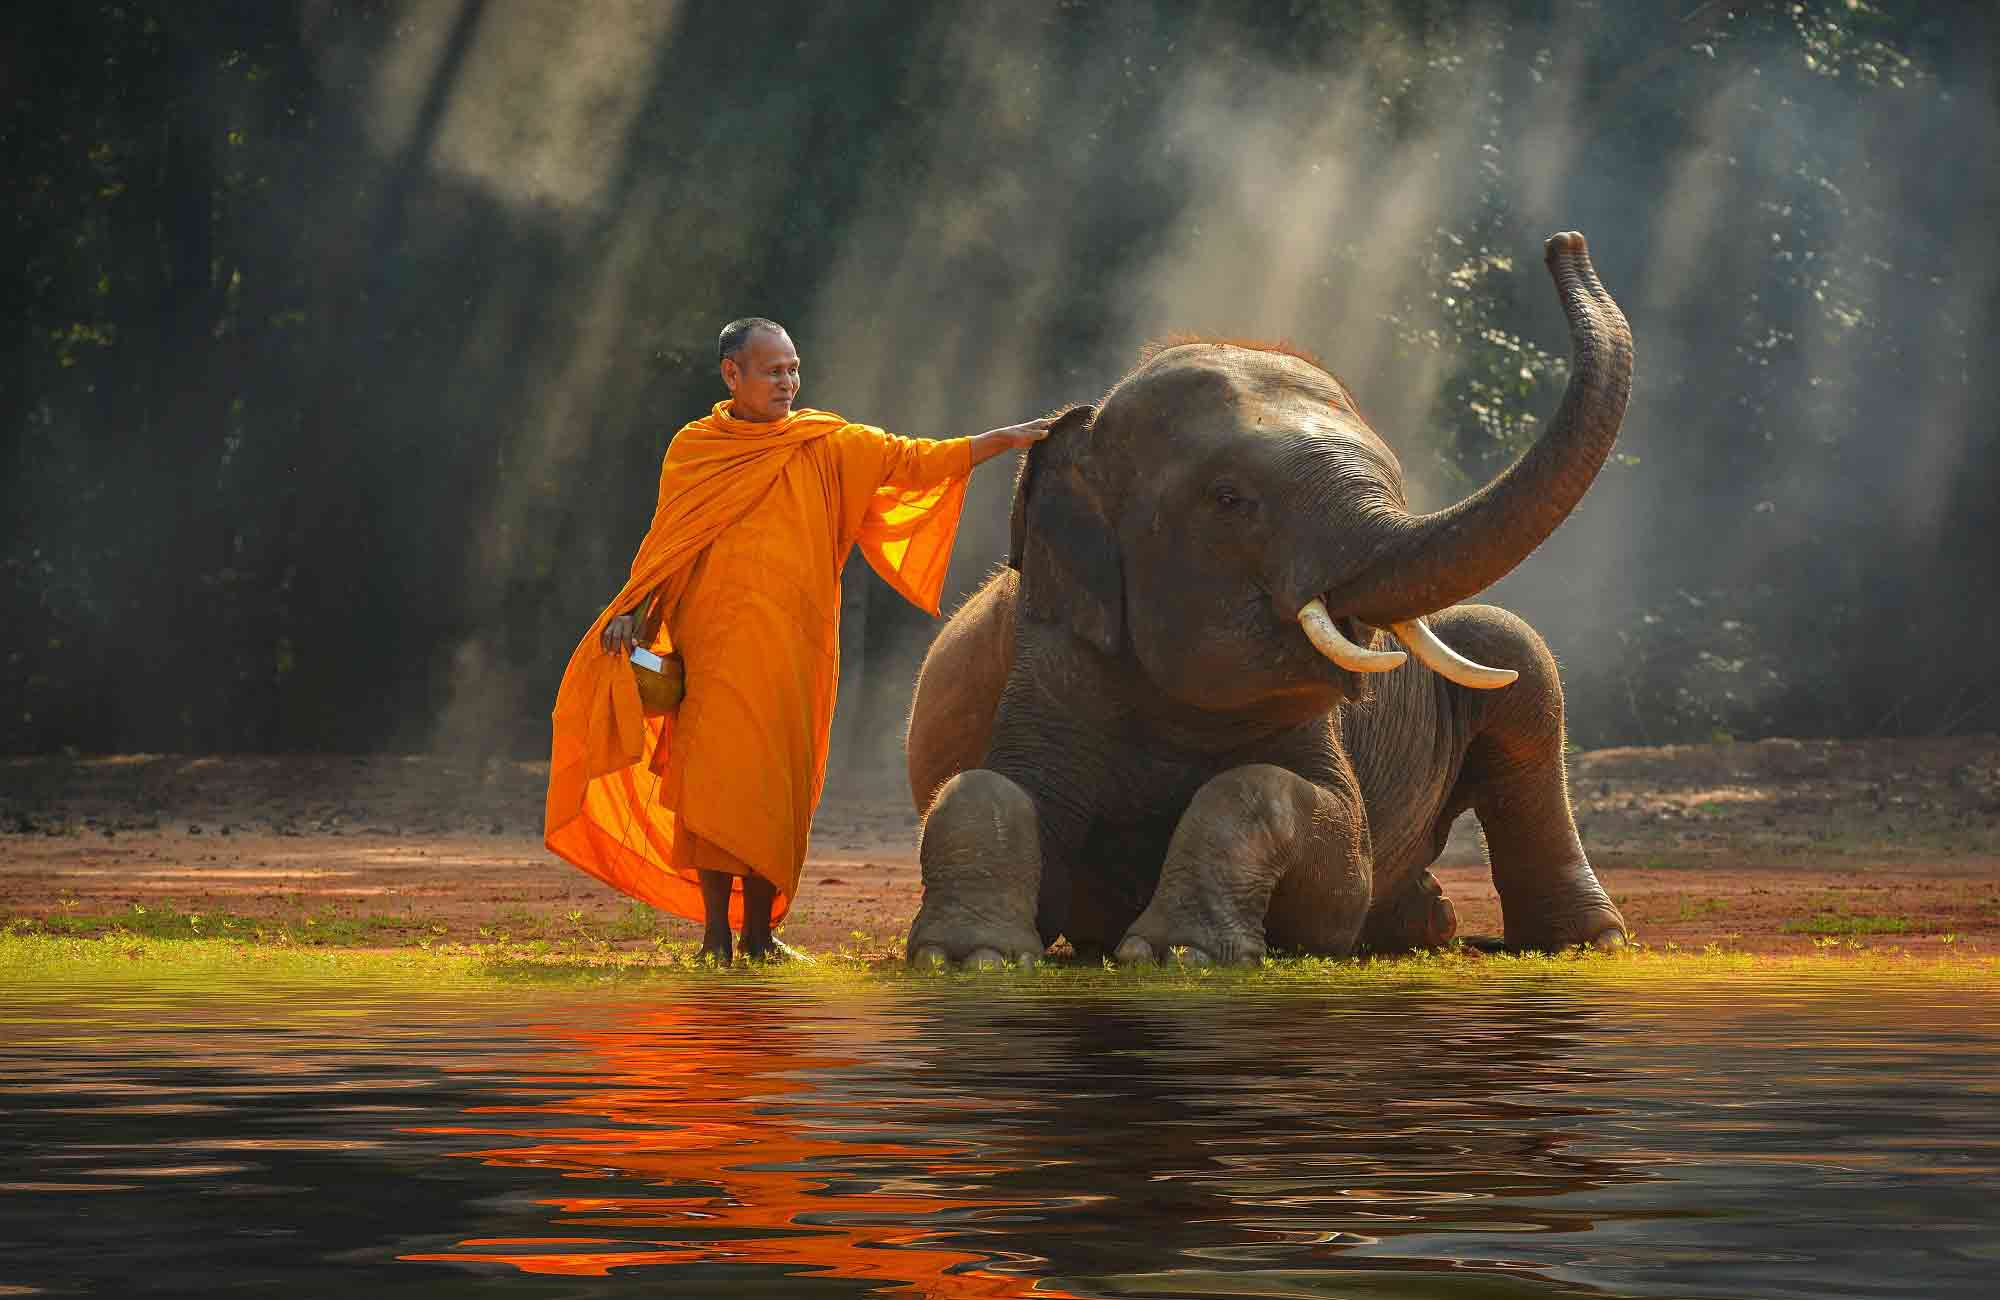 Voyage Thaïlande -Elephant - Amplitudes